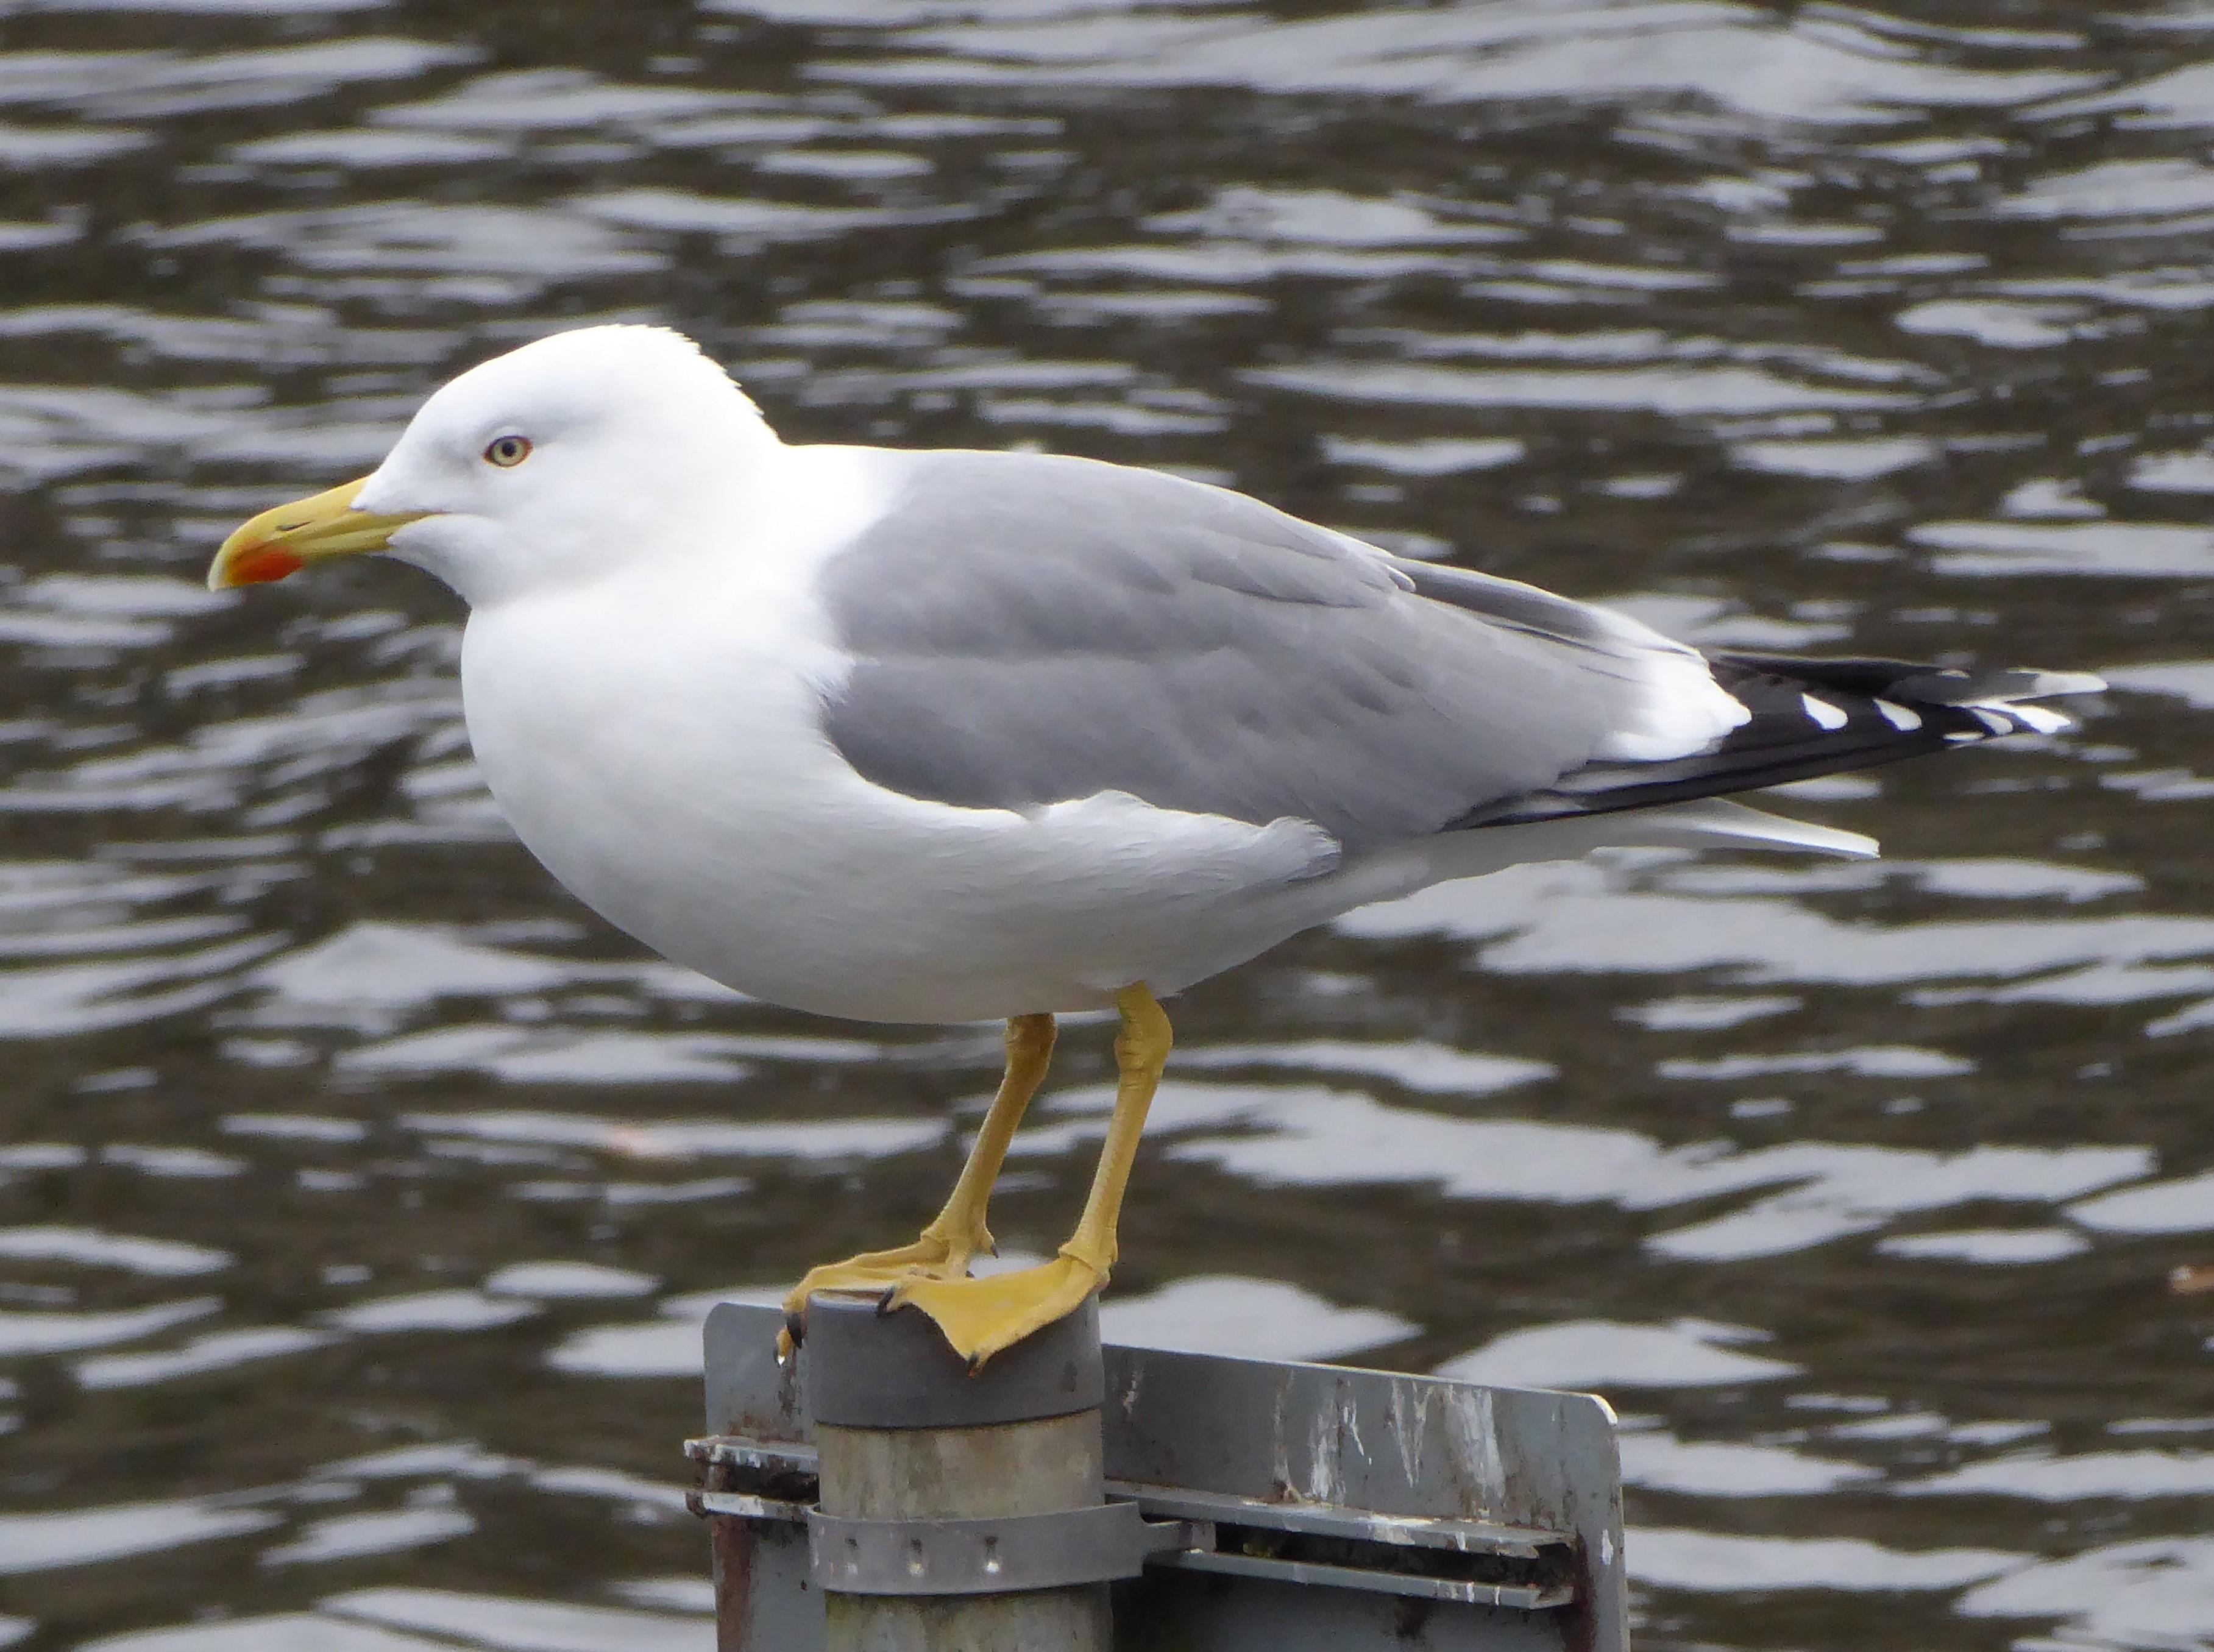 P1000825 Yellow Legged Gull Caerphilly Castle moat